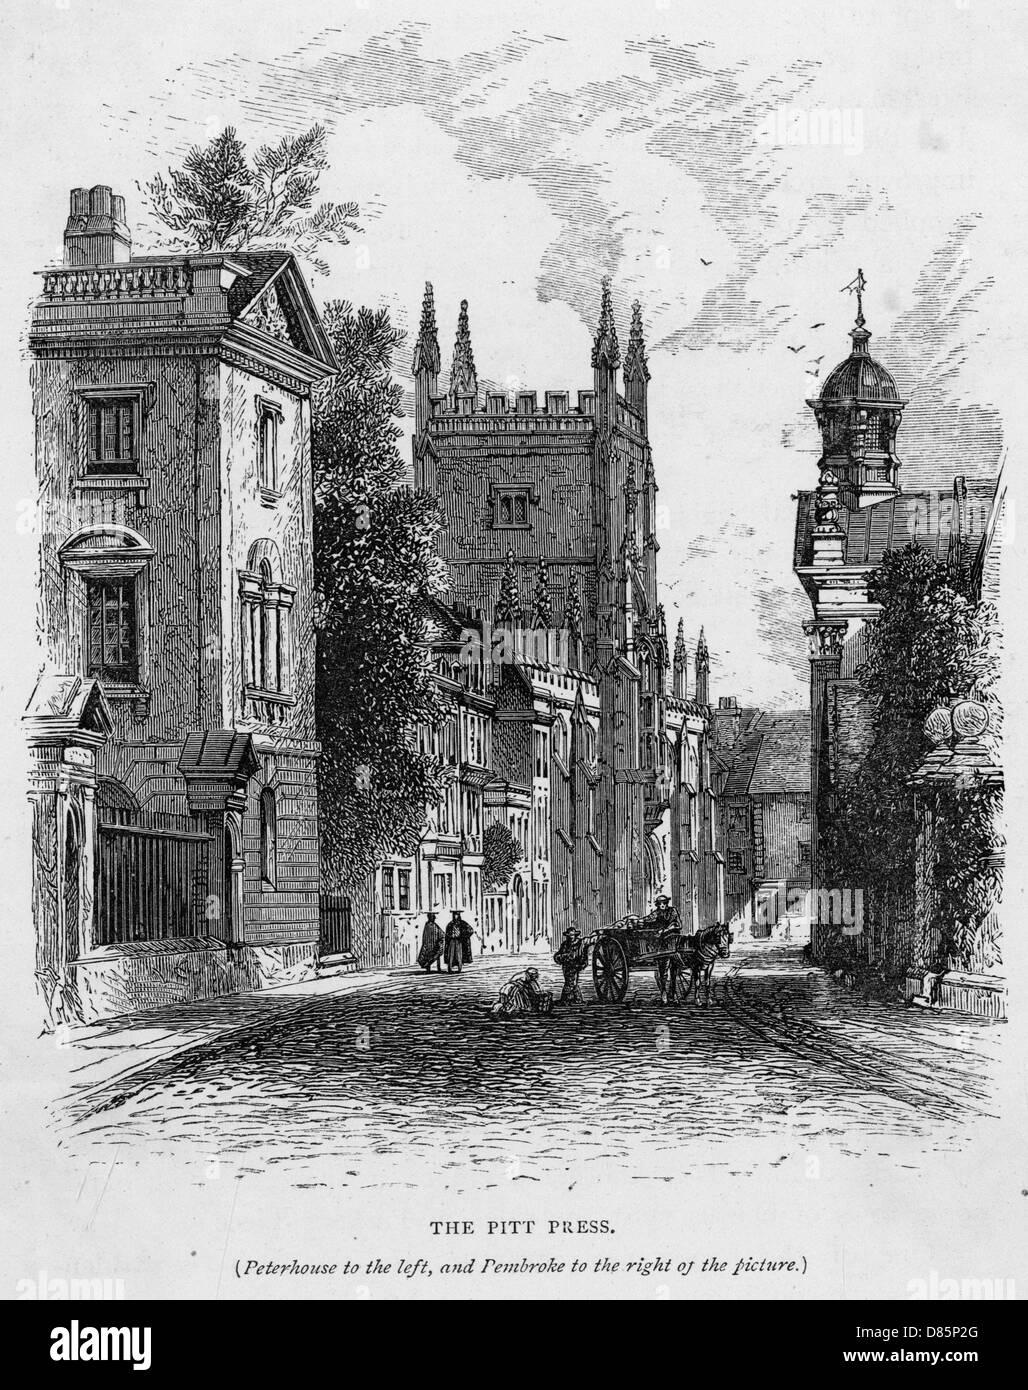 Cambridge Press - Stock Image